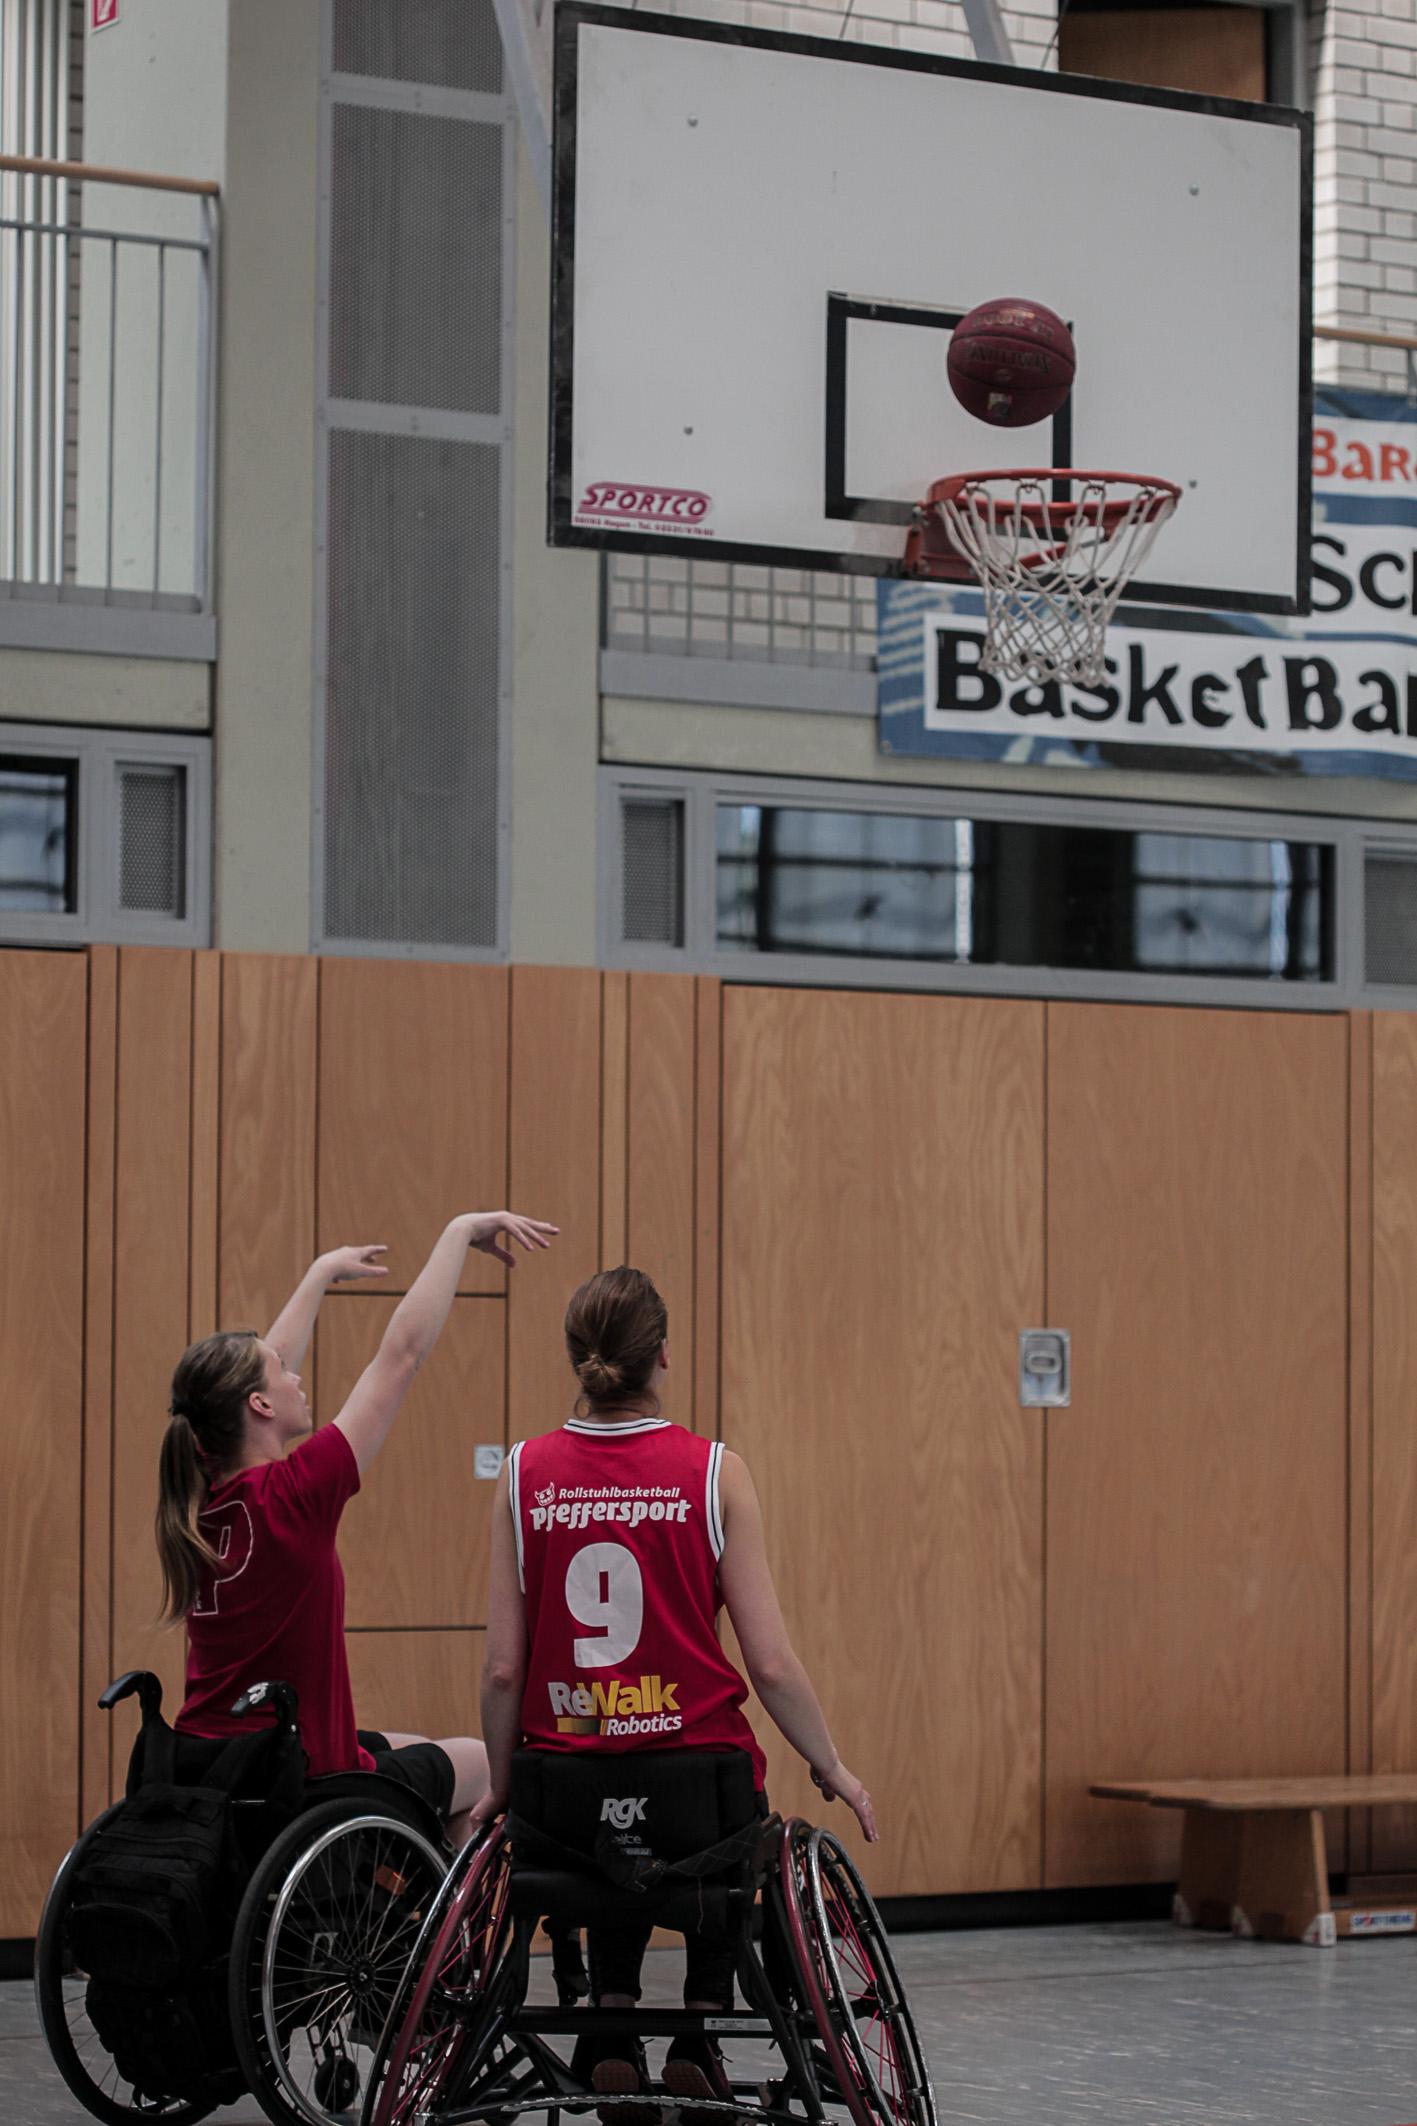 06.05.2018 Inklusionswoche Berlin Lichtenberg